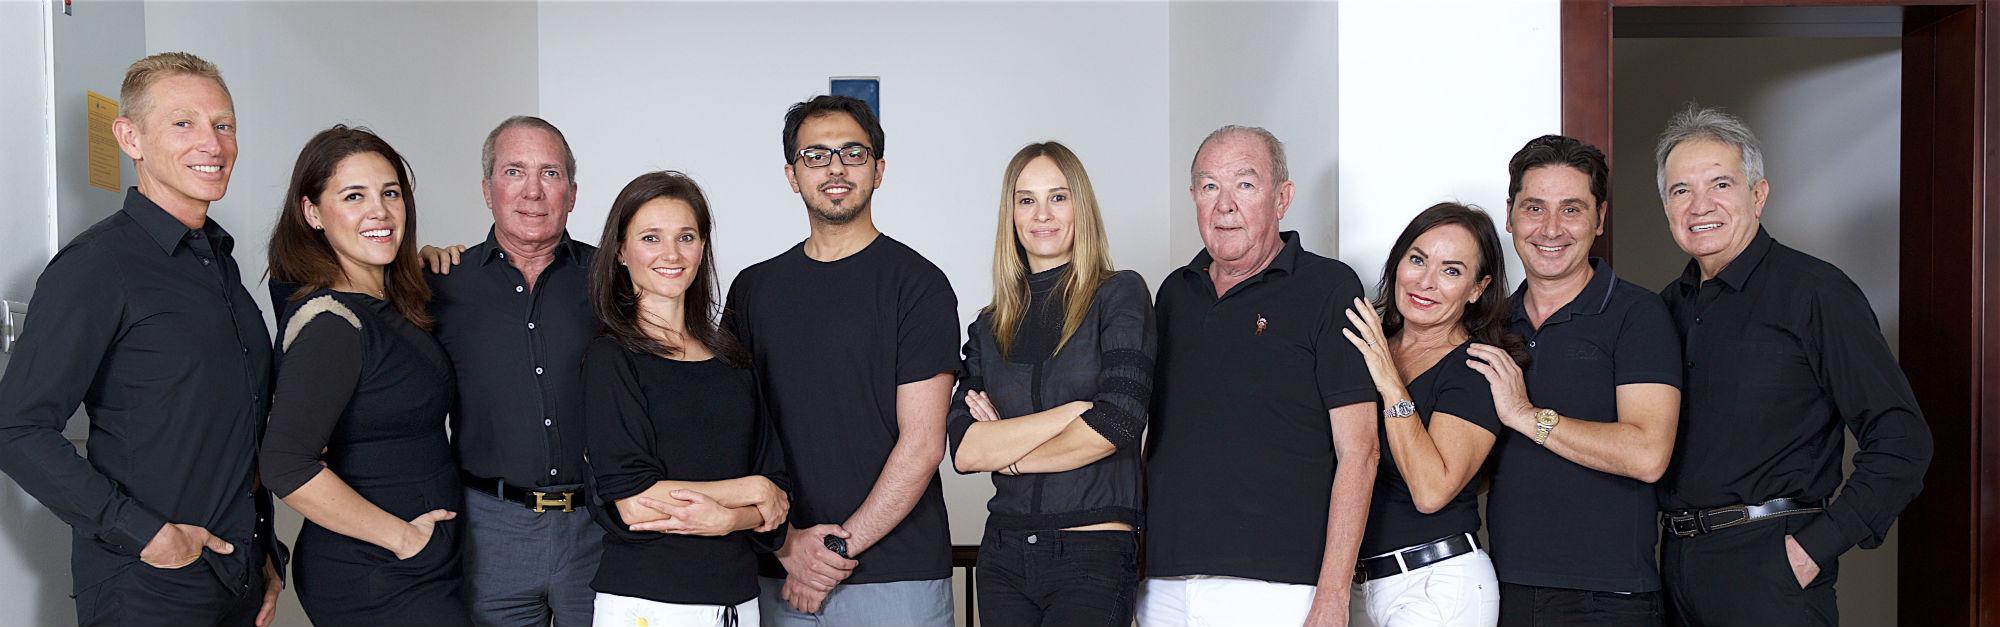 Vilafrortuny Dubai Team